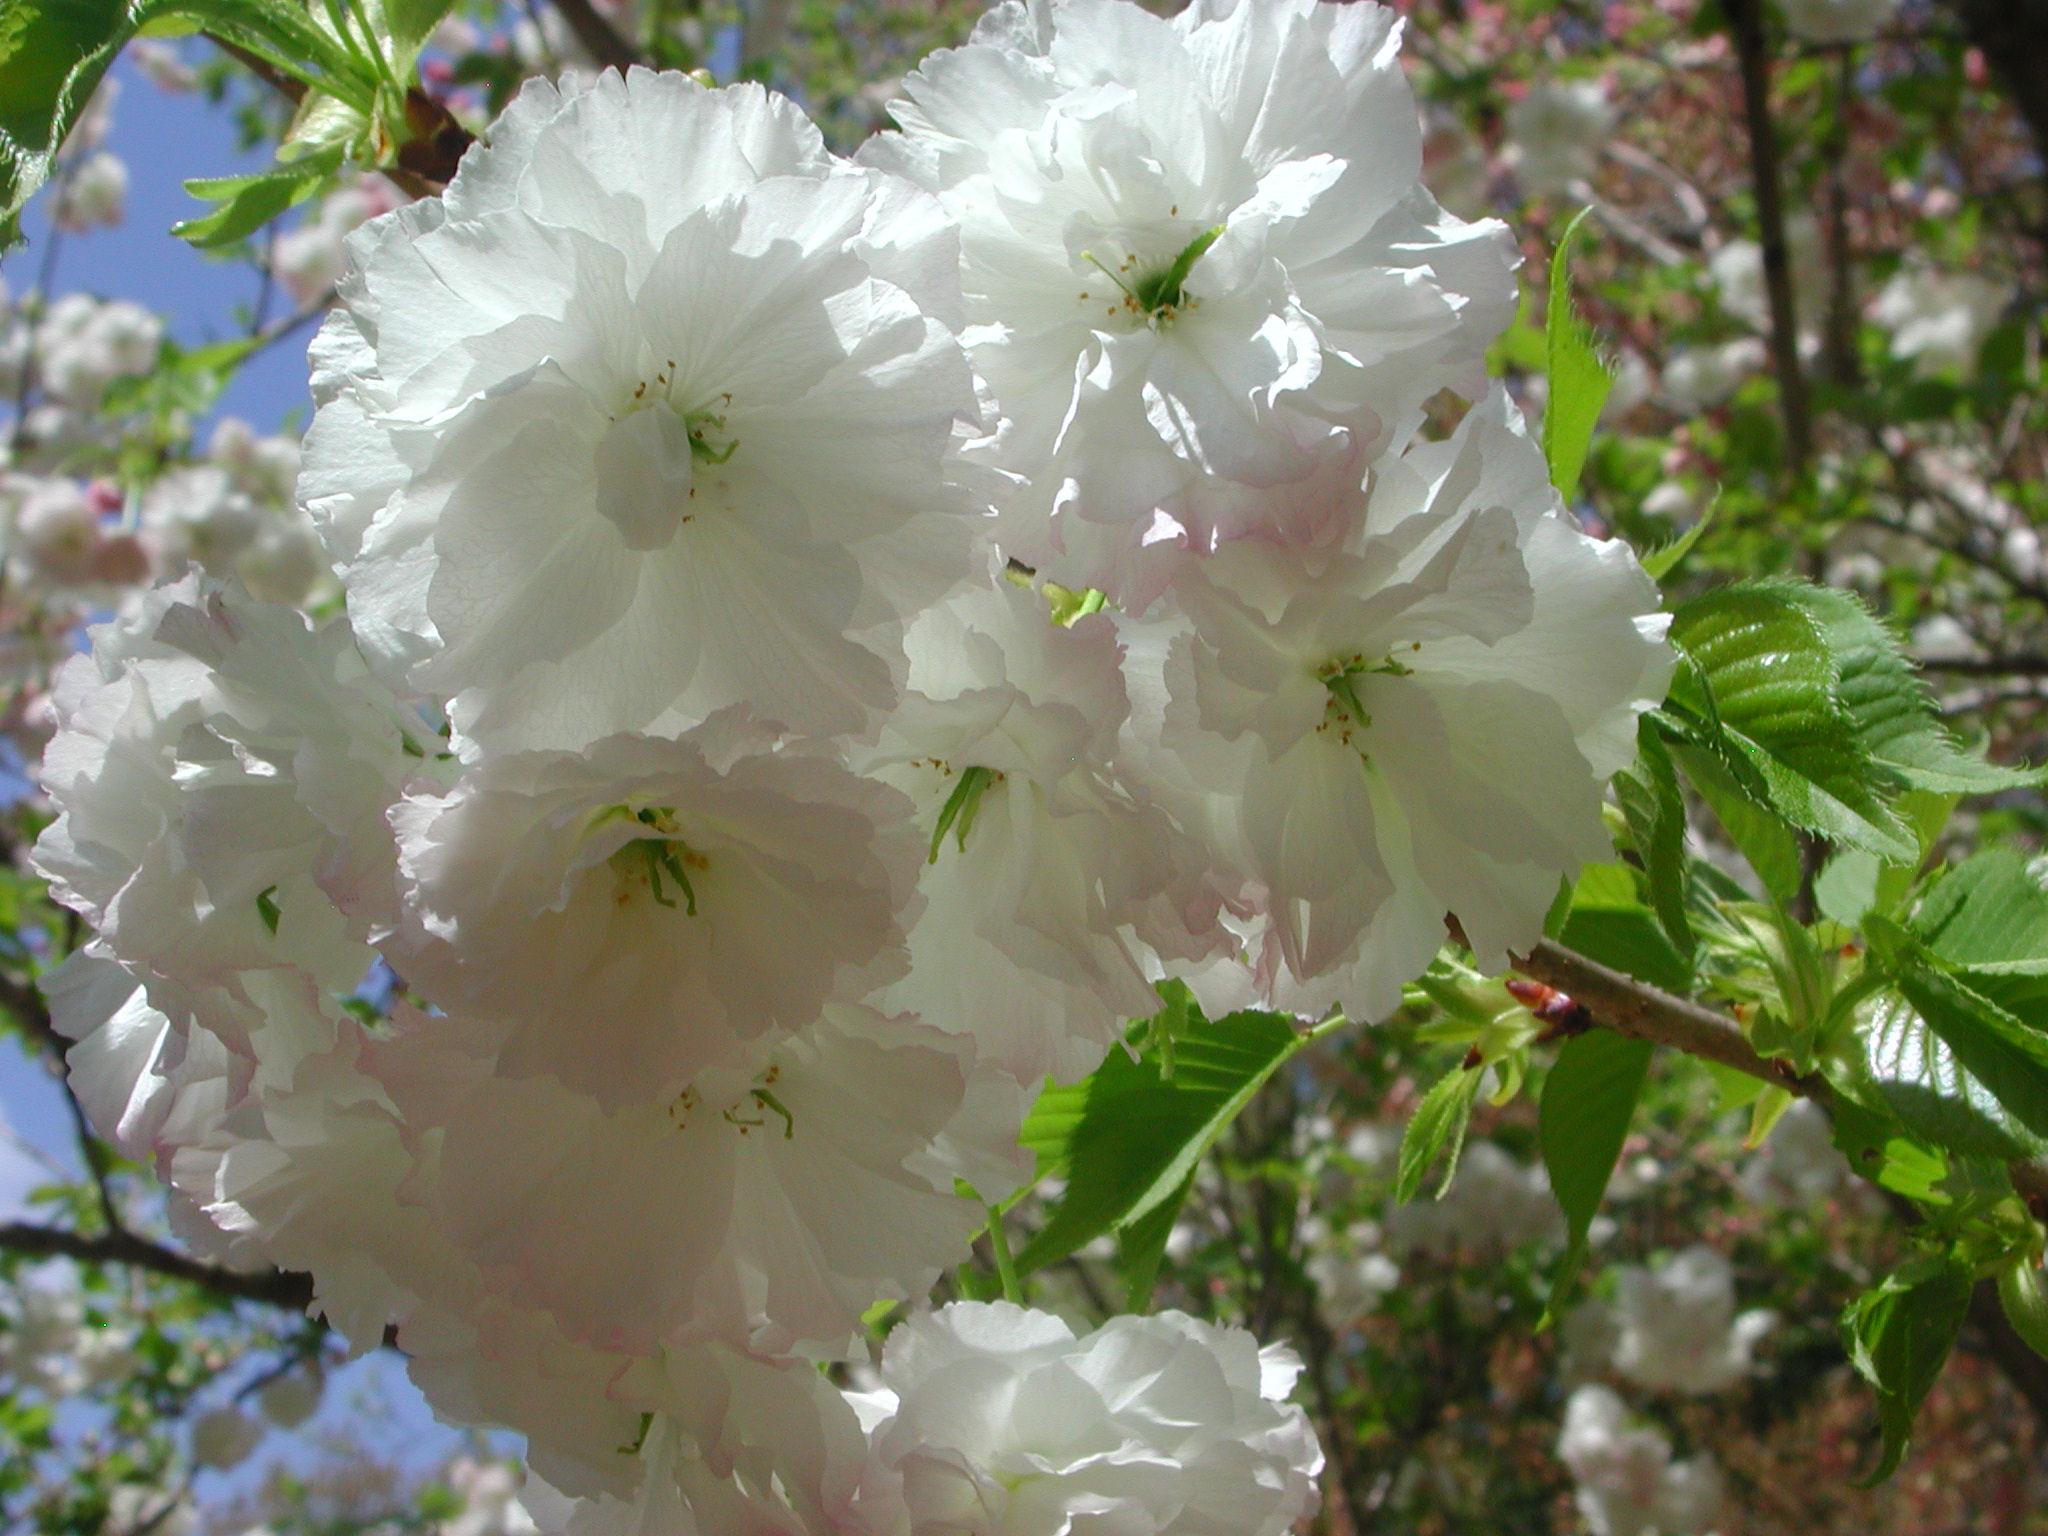 Hanami 2011: Variedades de cerezos en Flor. | Nekotabi